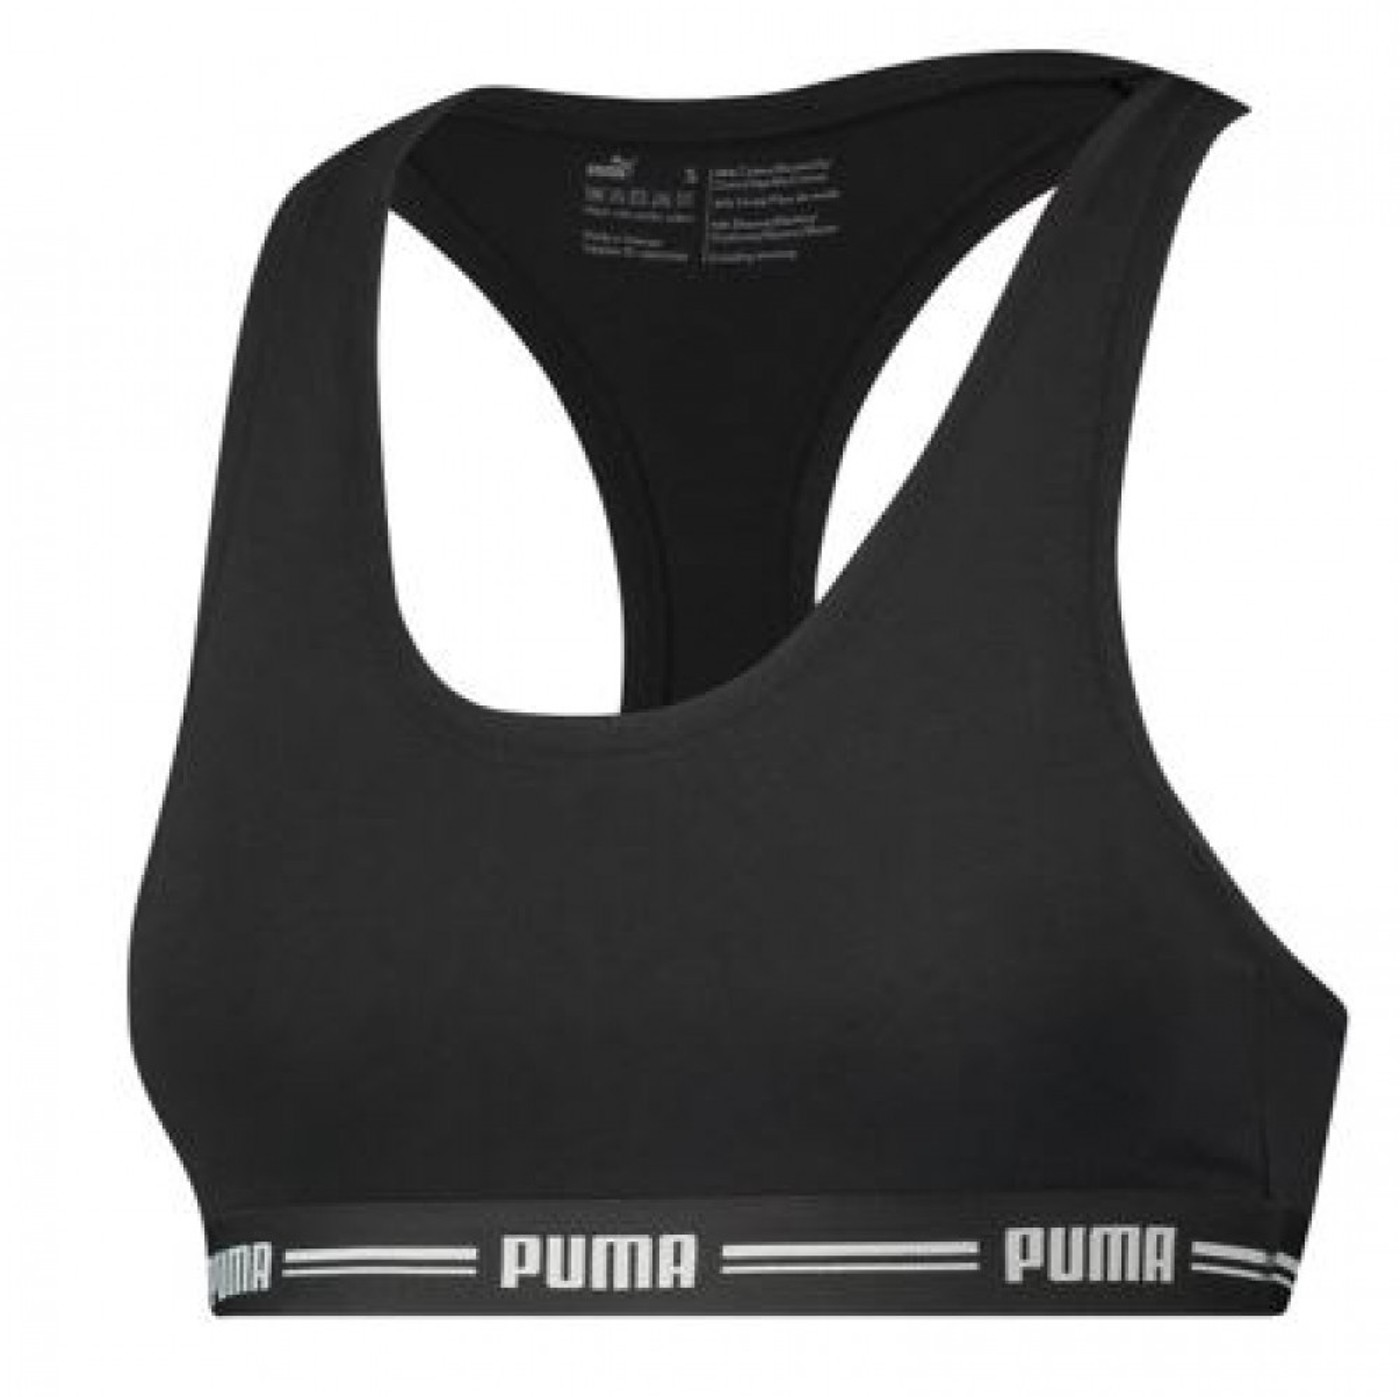 PUMA ICONIC RACER BACK BRA 1P - Damen